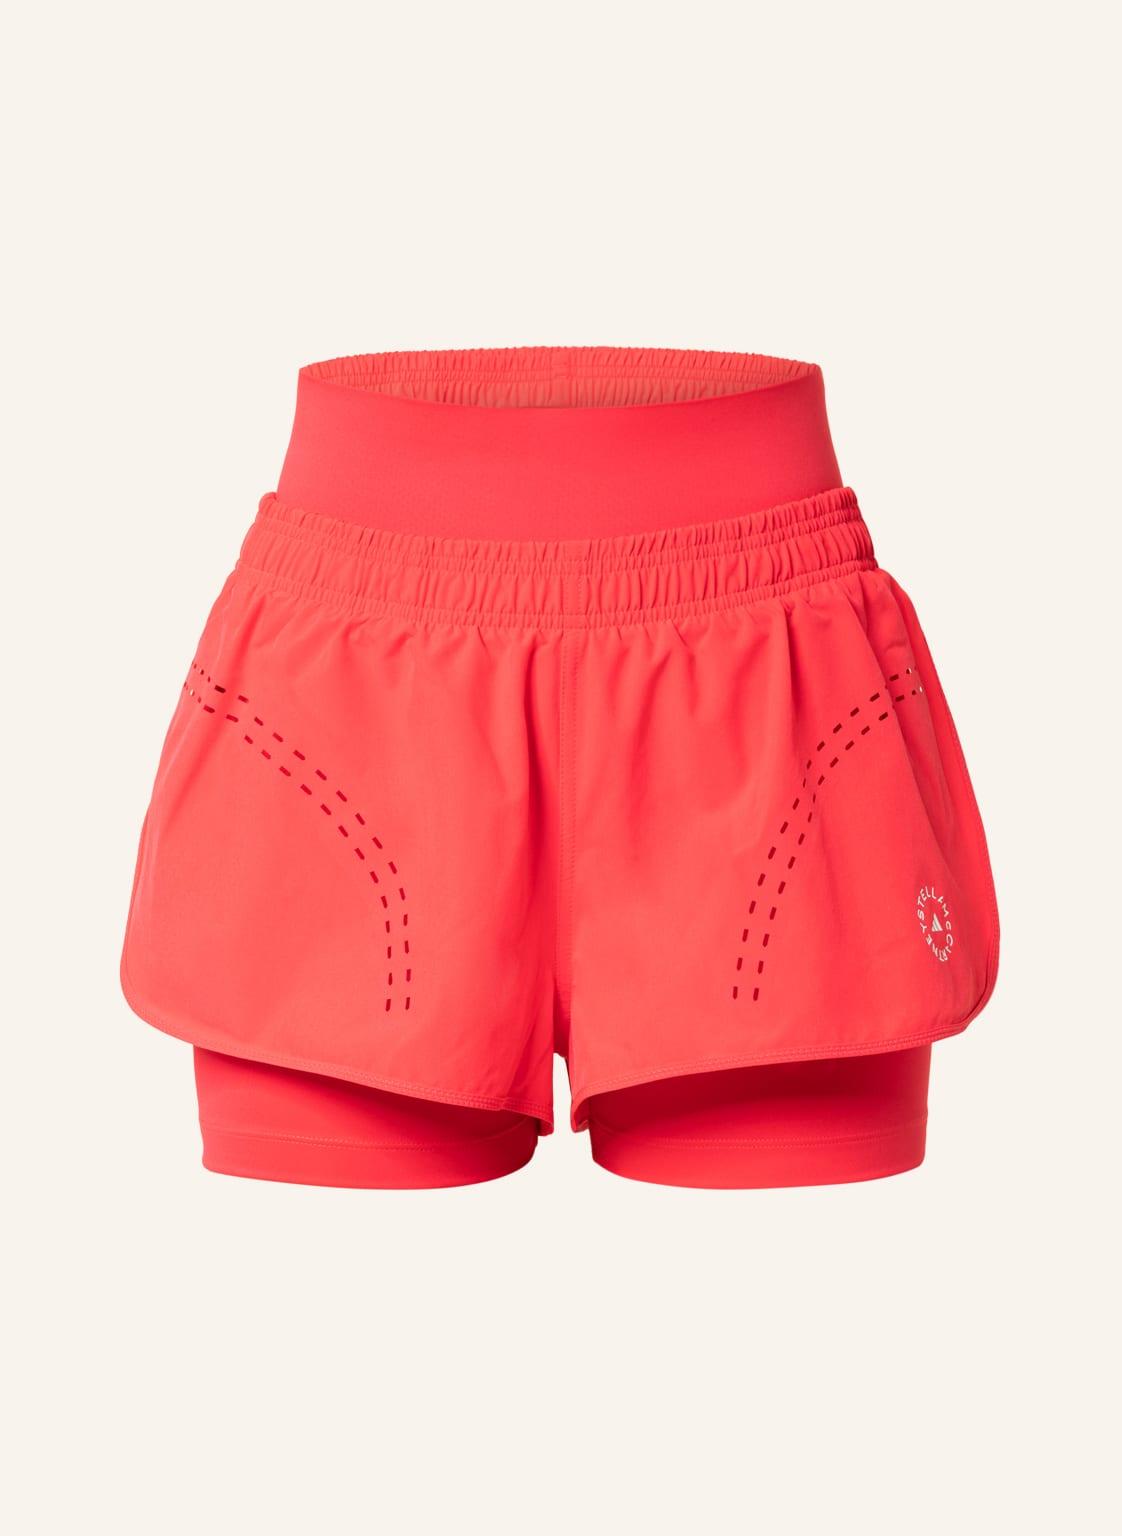 Image of Adidas By Stella Mccartney 2-In-1-Fitnessshorts Truepurpose High Intensity pink